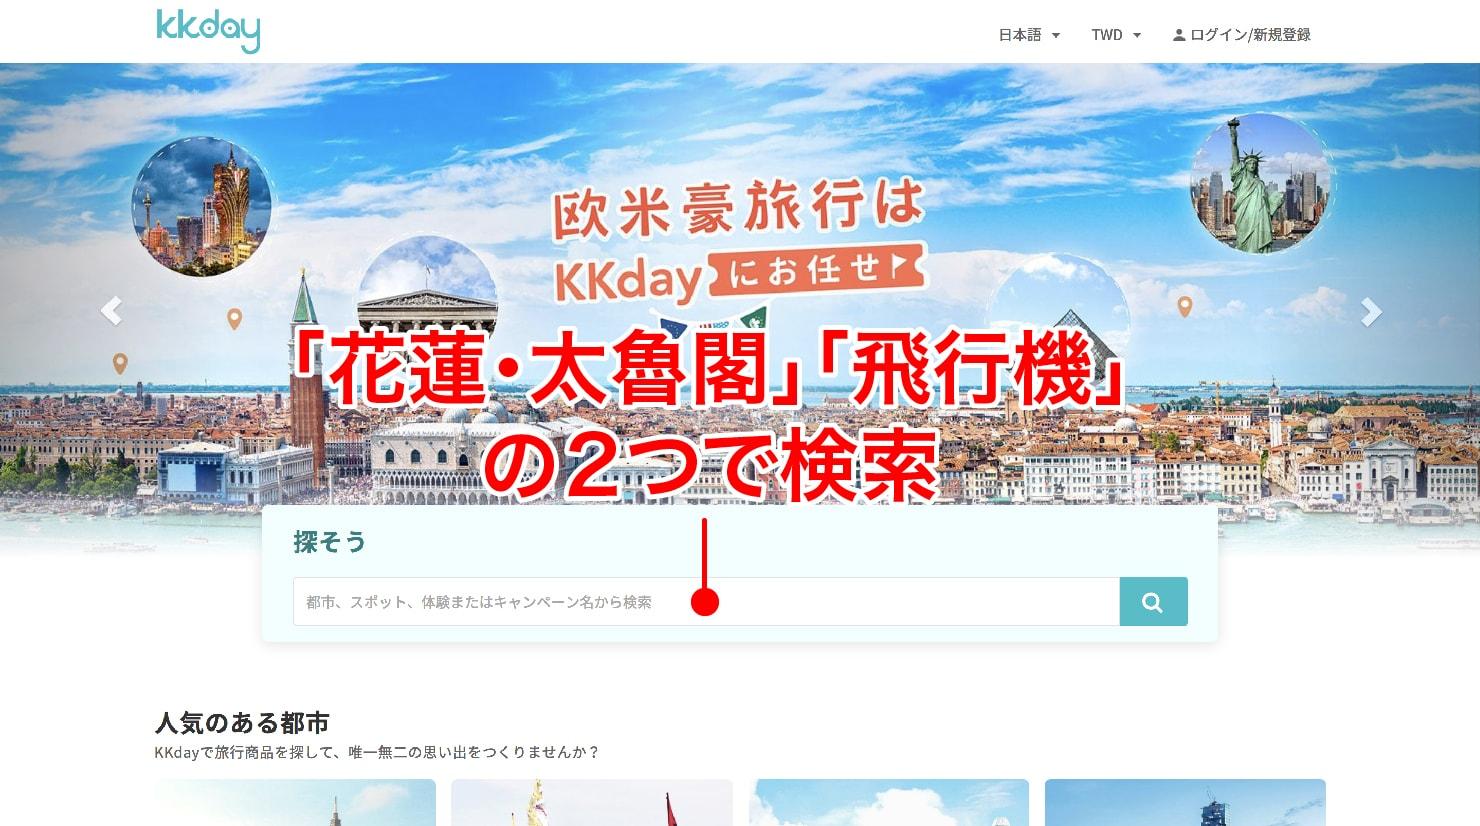 KKday外国人限定「花蓮・太魯閣(タロコ)日帰りツアー」の予約画面1